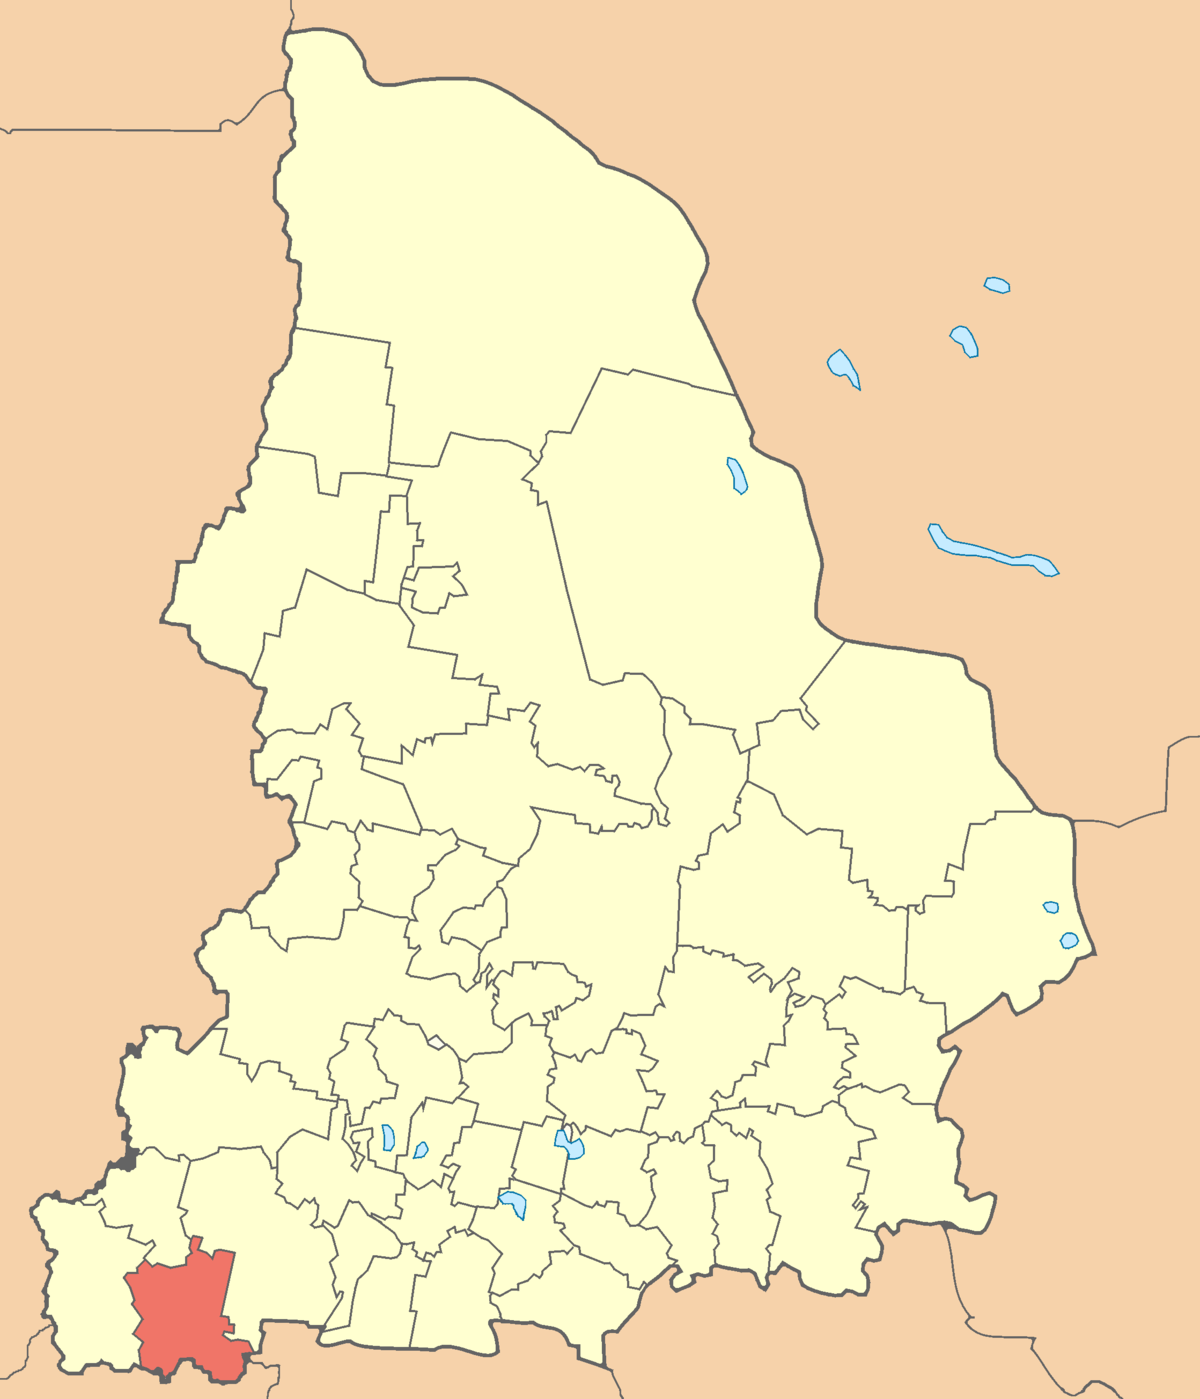 Sverdlovsk region - the rivers Tura, Pyshma, Kamenka: description, description and photo